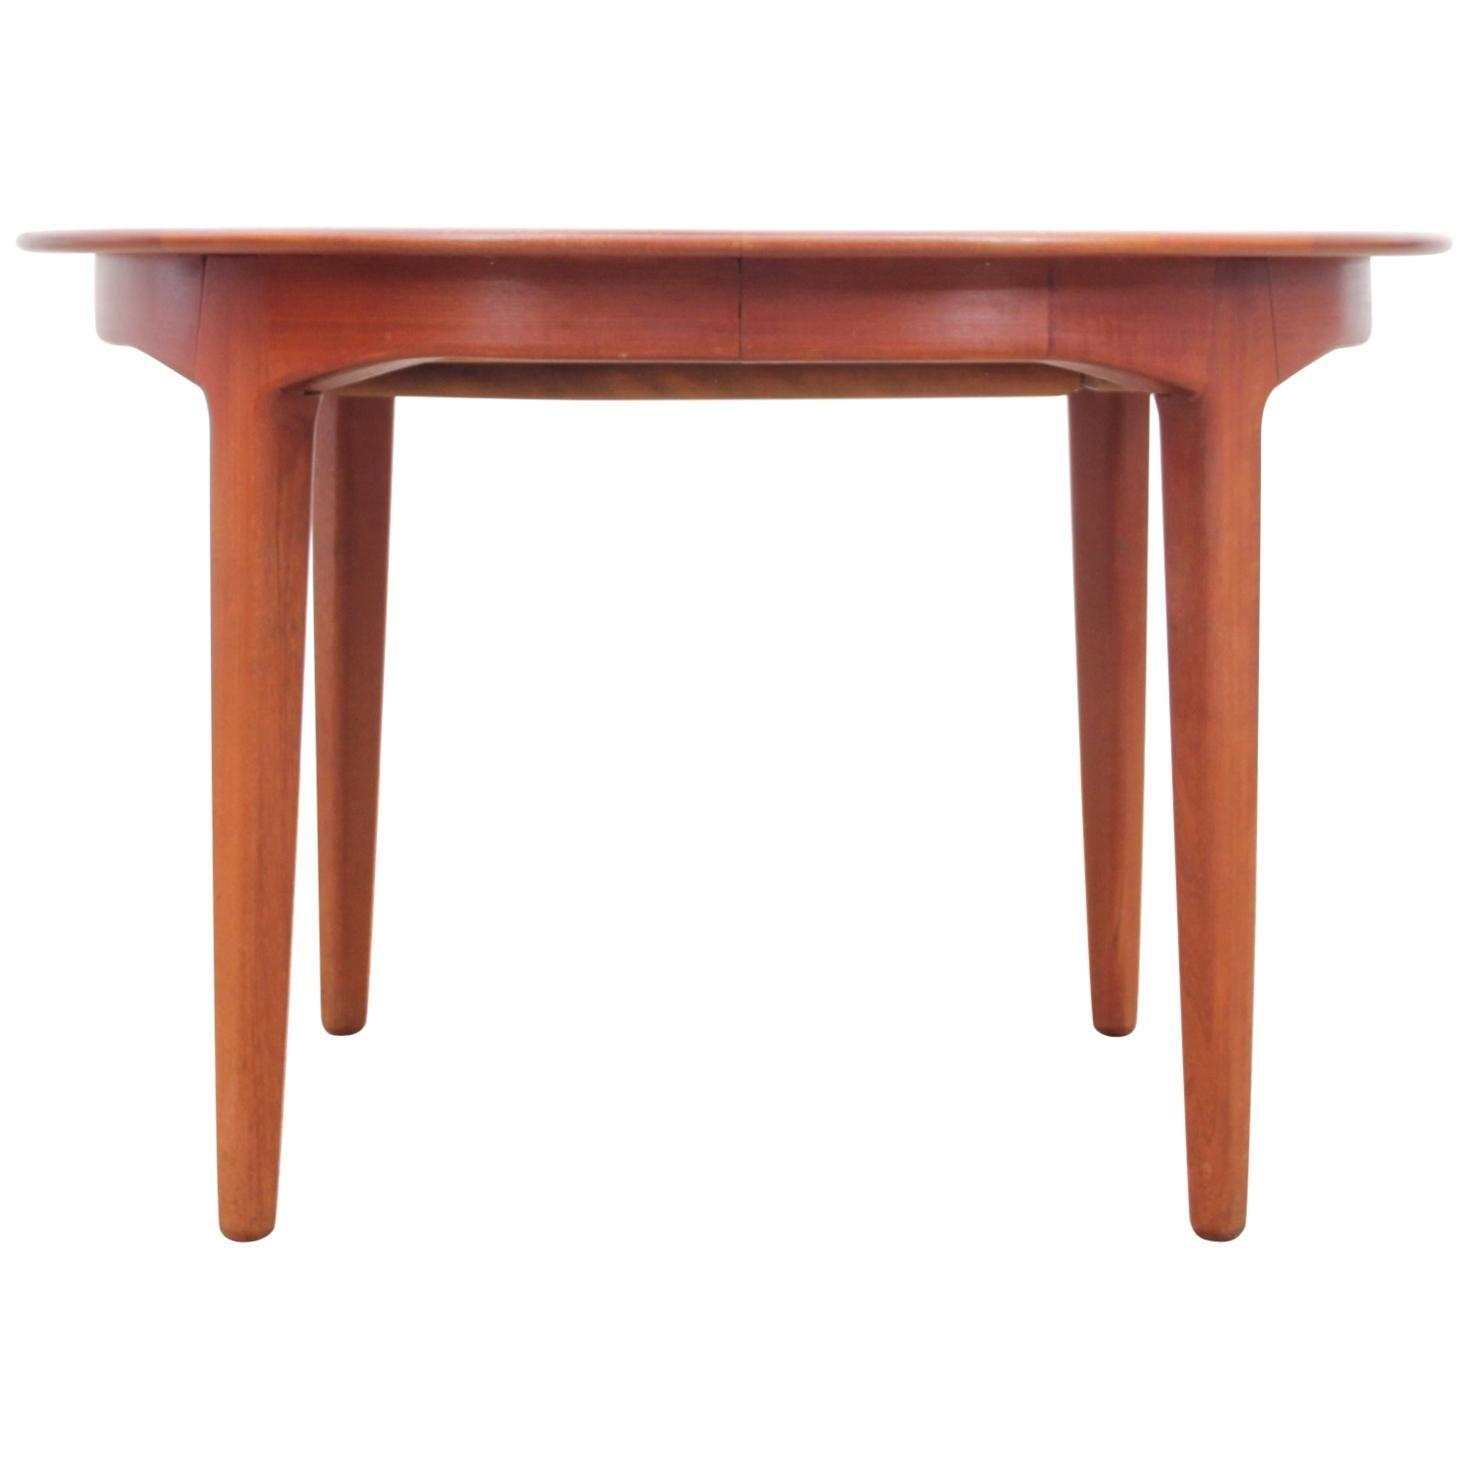 Mid-Century Modern Scandinavian Circular Dining Table in Teak by Kjaernulf